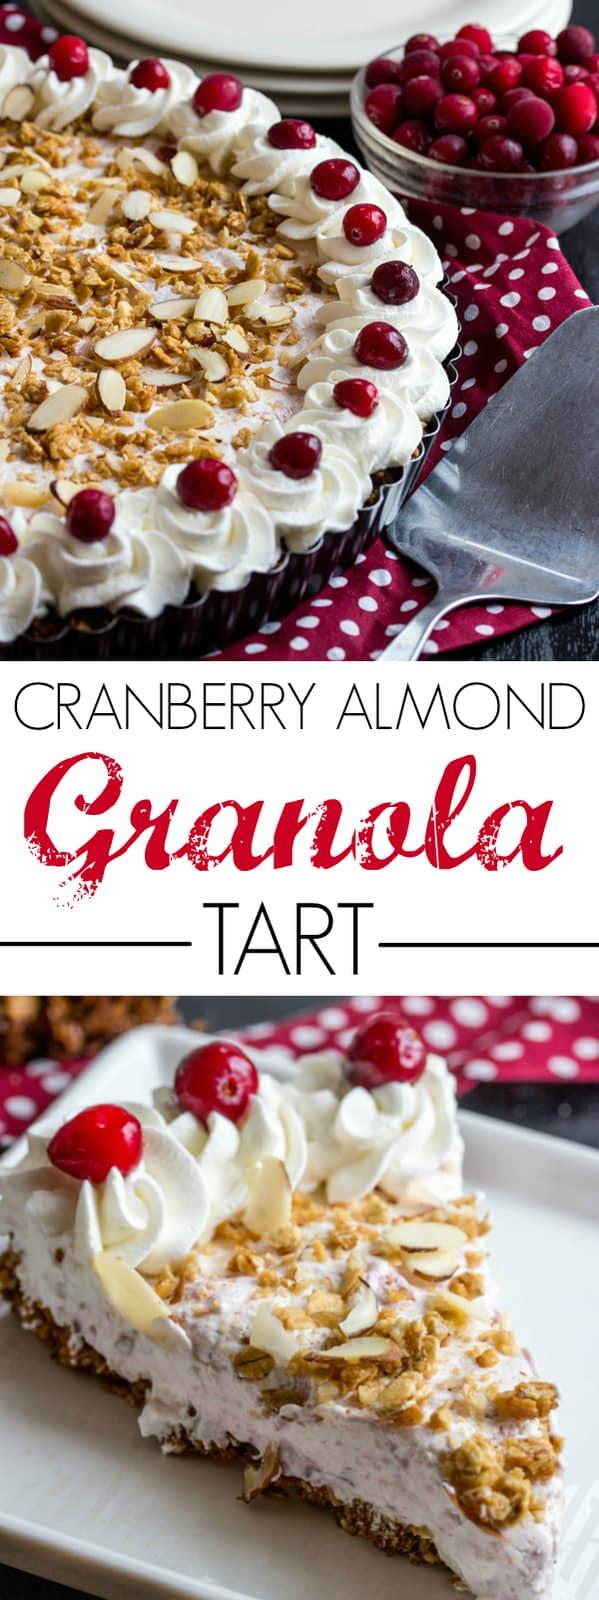 Cranberry Almond Granola Tart